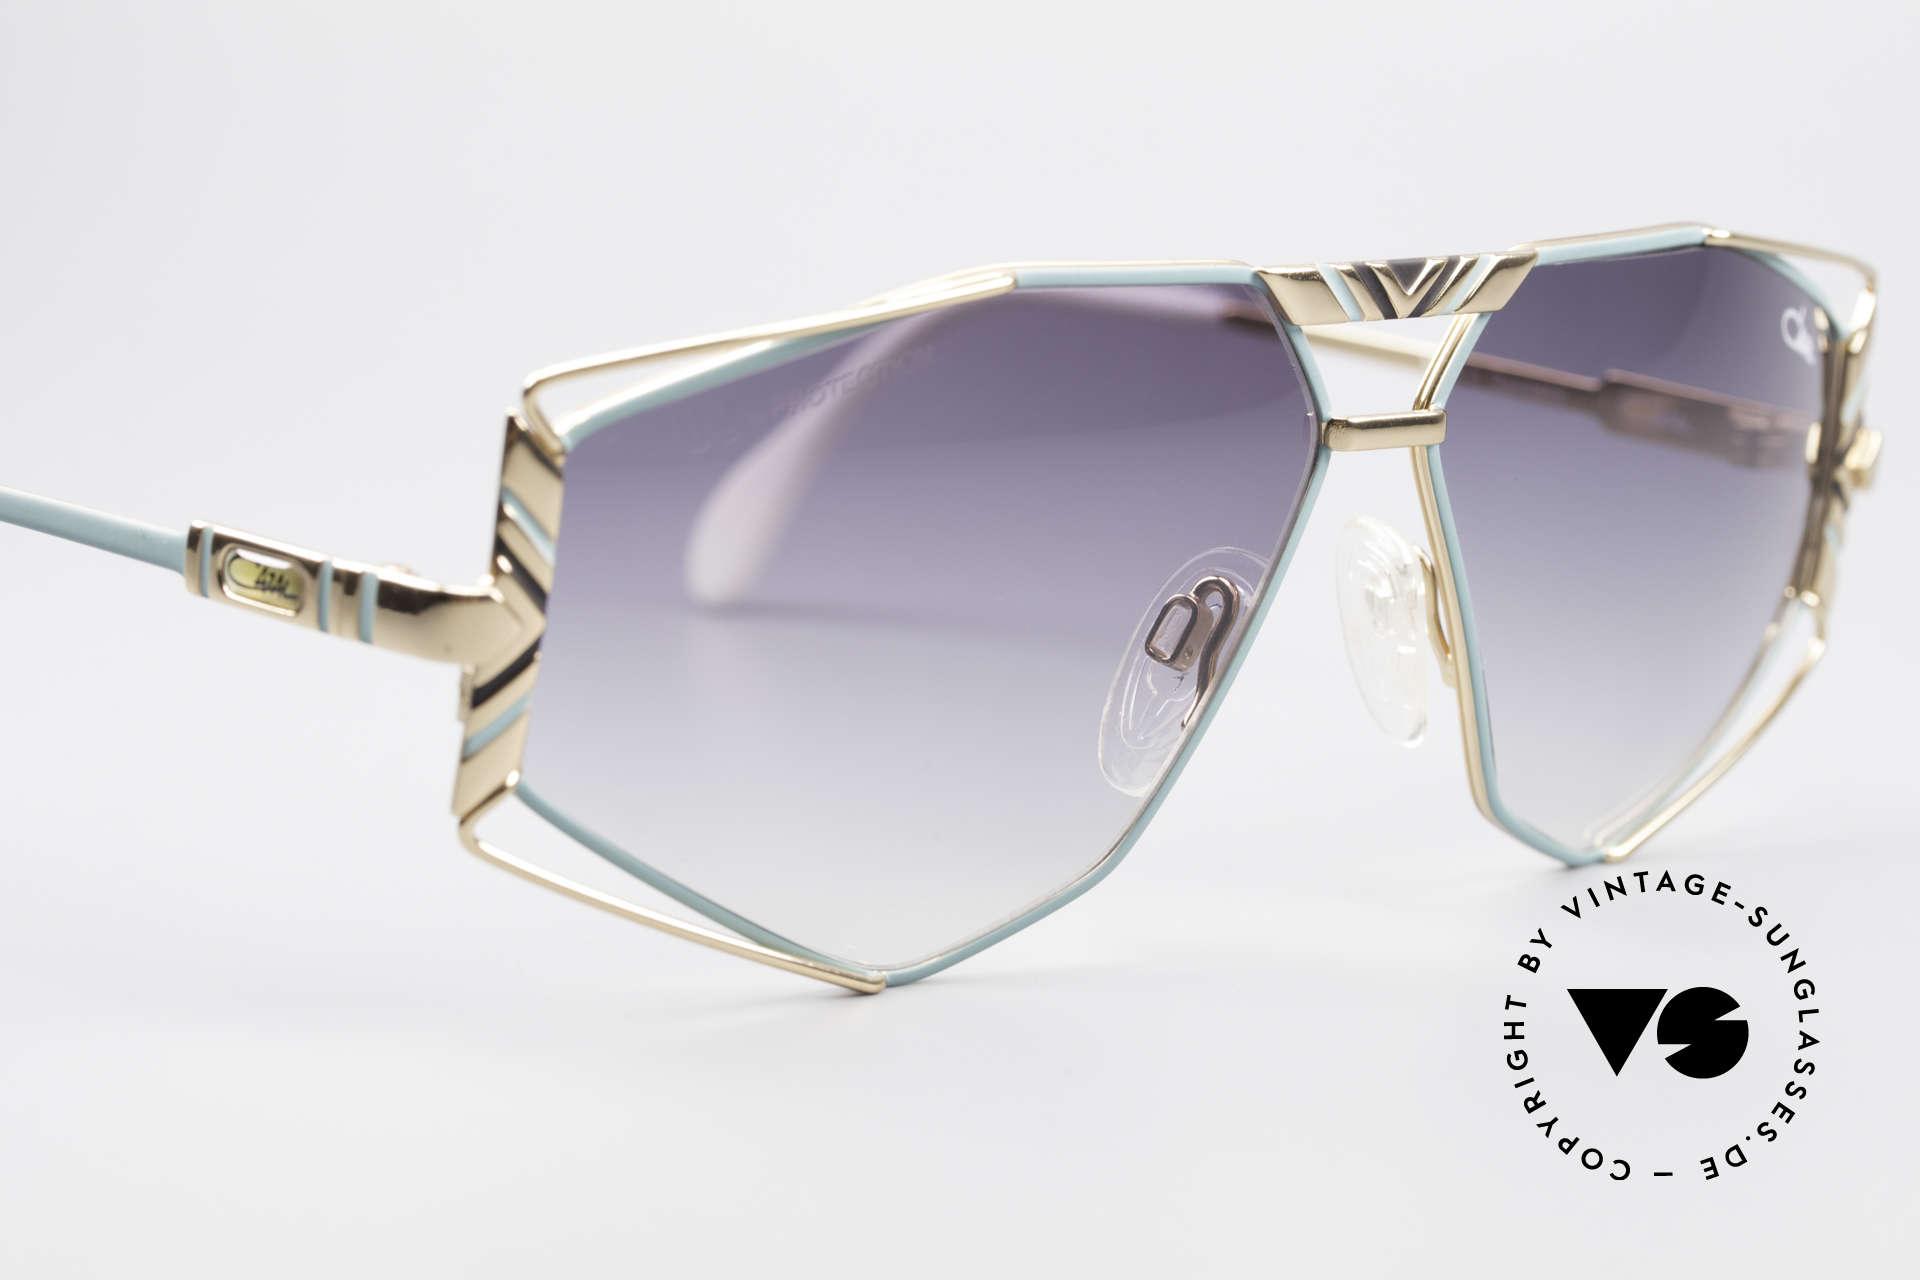 Cazal 956 Cari Zalloni Vintage Shades, NO RETRO fashion, but a rare old Cazal Original, Made for Men and Women